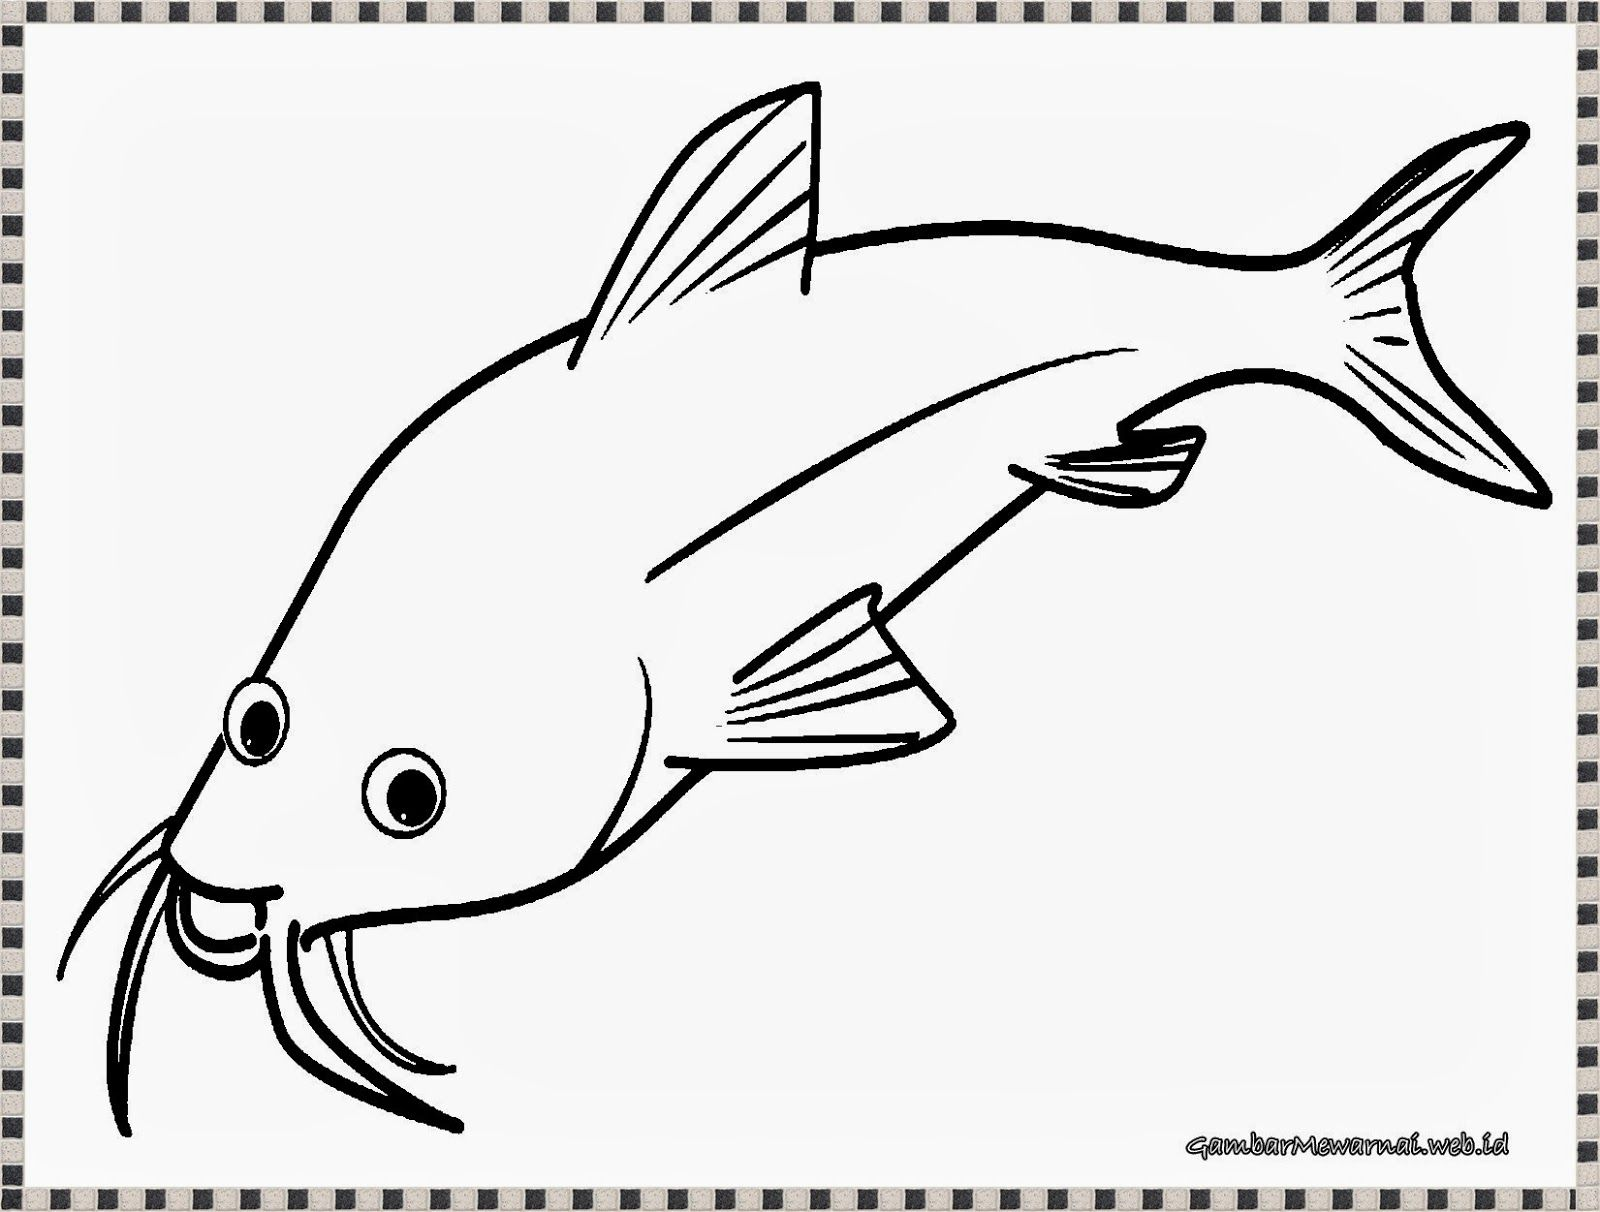 belajar mewarnai gambar ikan patin